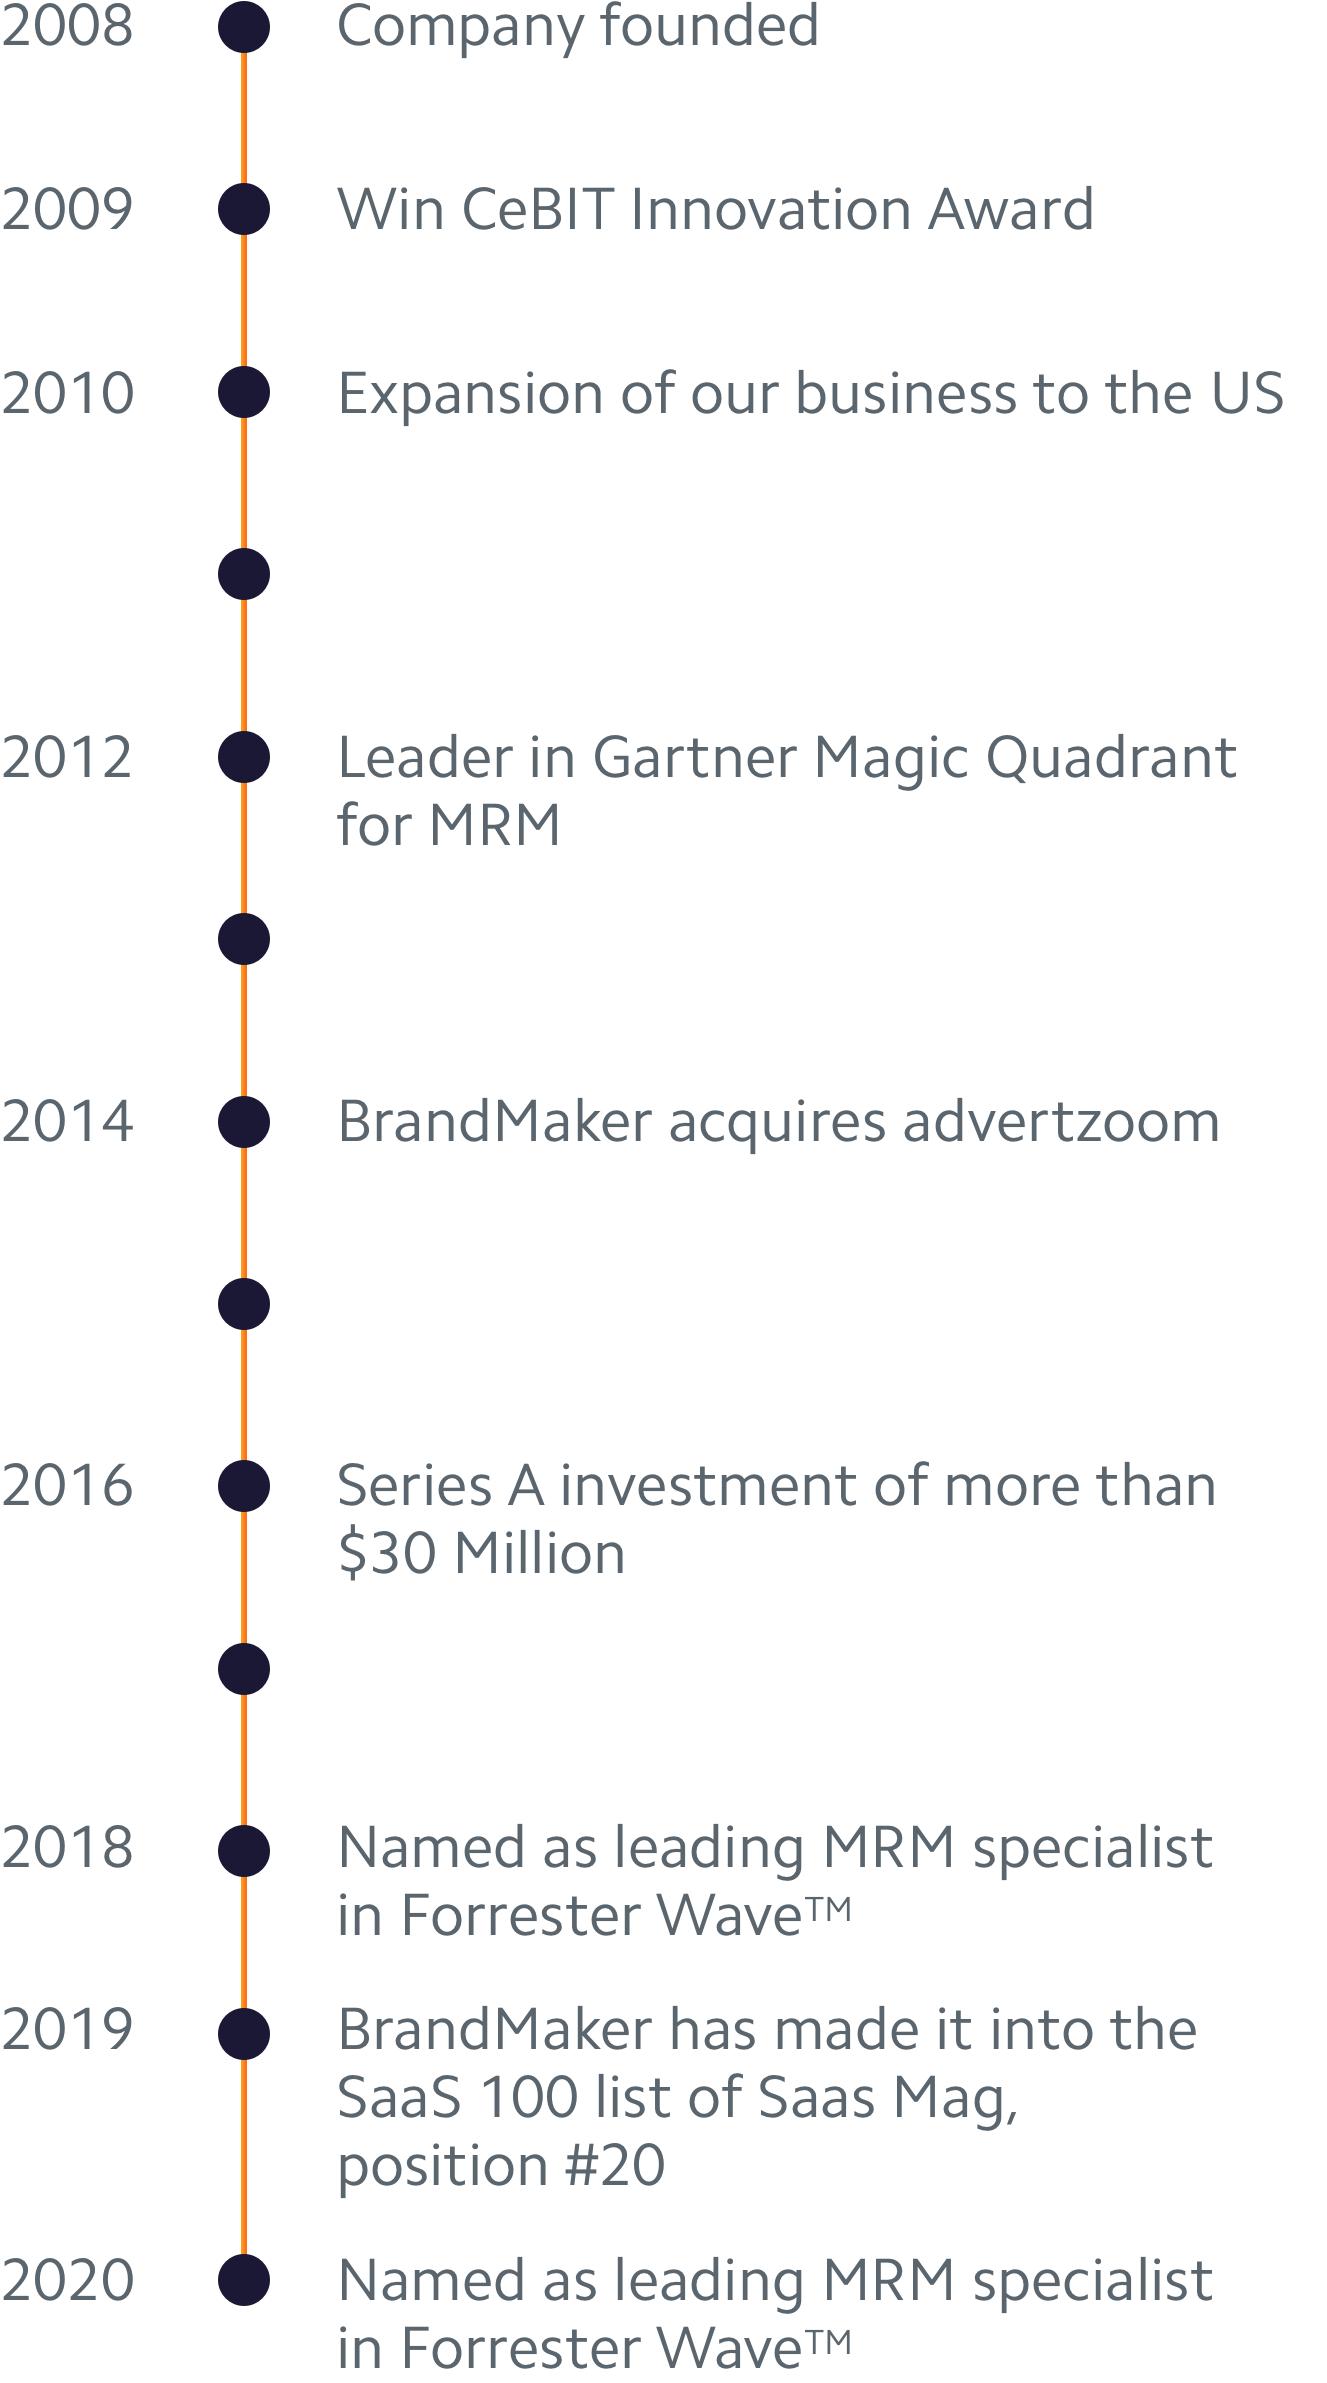 History Milestones of BrandMaker 2008-2020